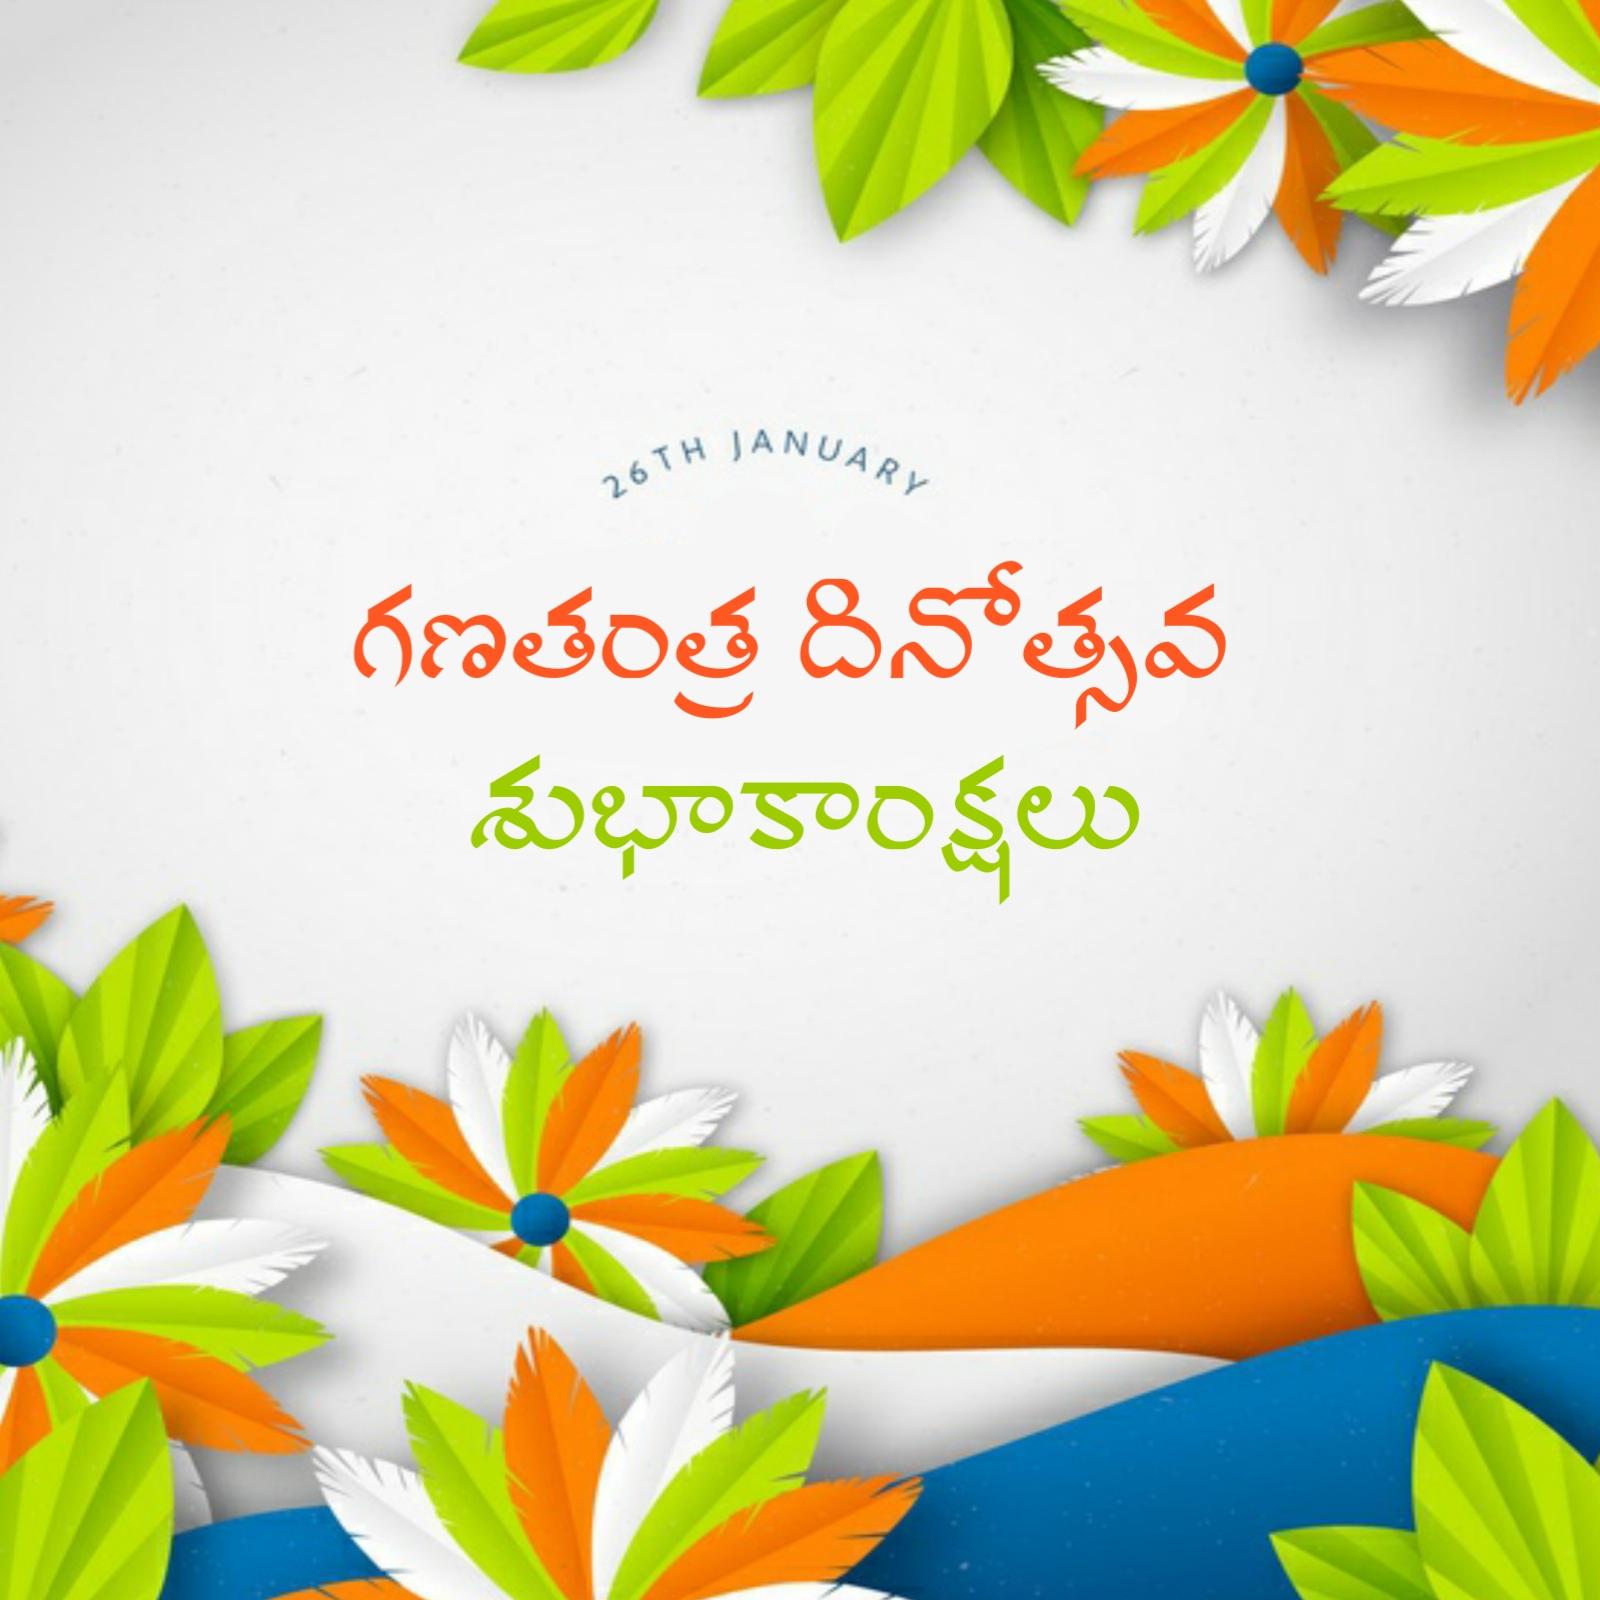 Republic Day Telugu Images 2021